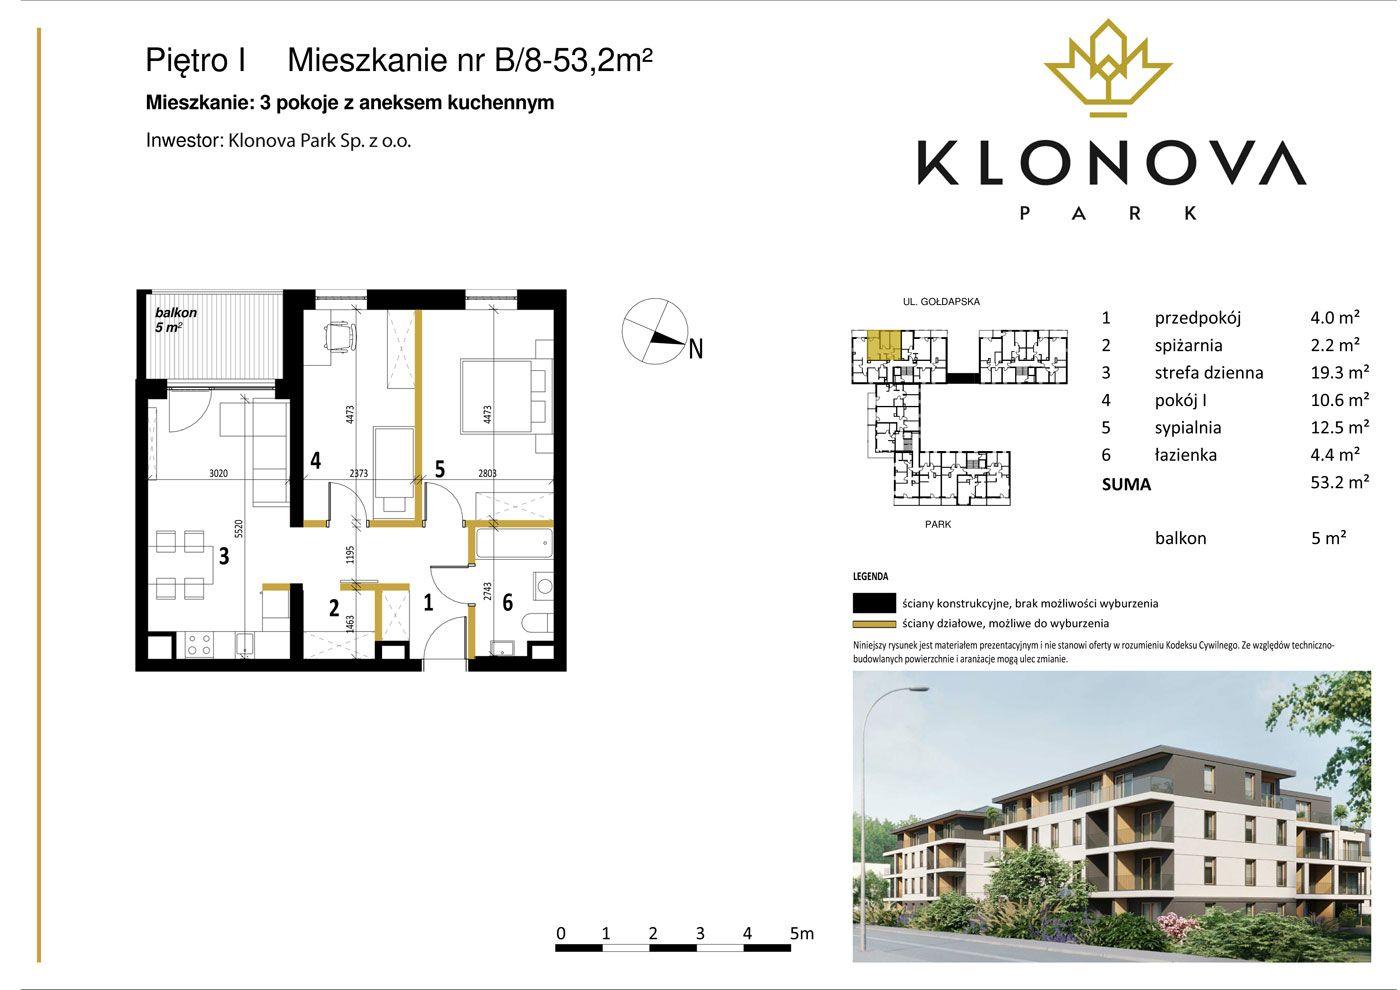 Apartamenty Klonova Park - Plan mieszkania B/8